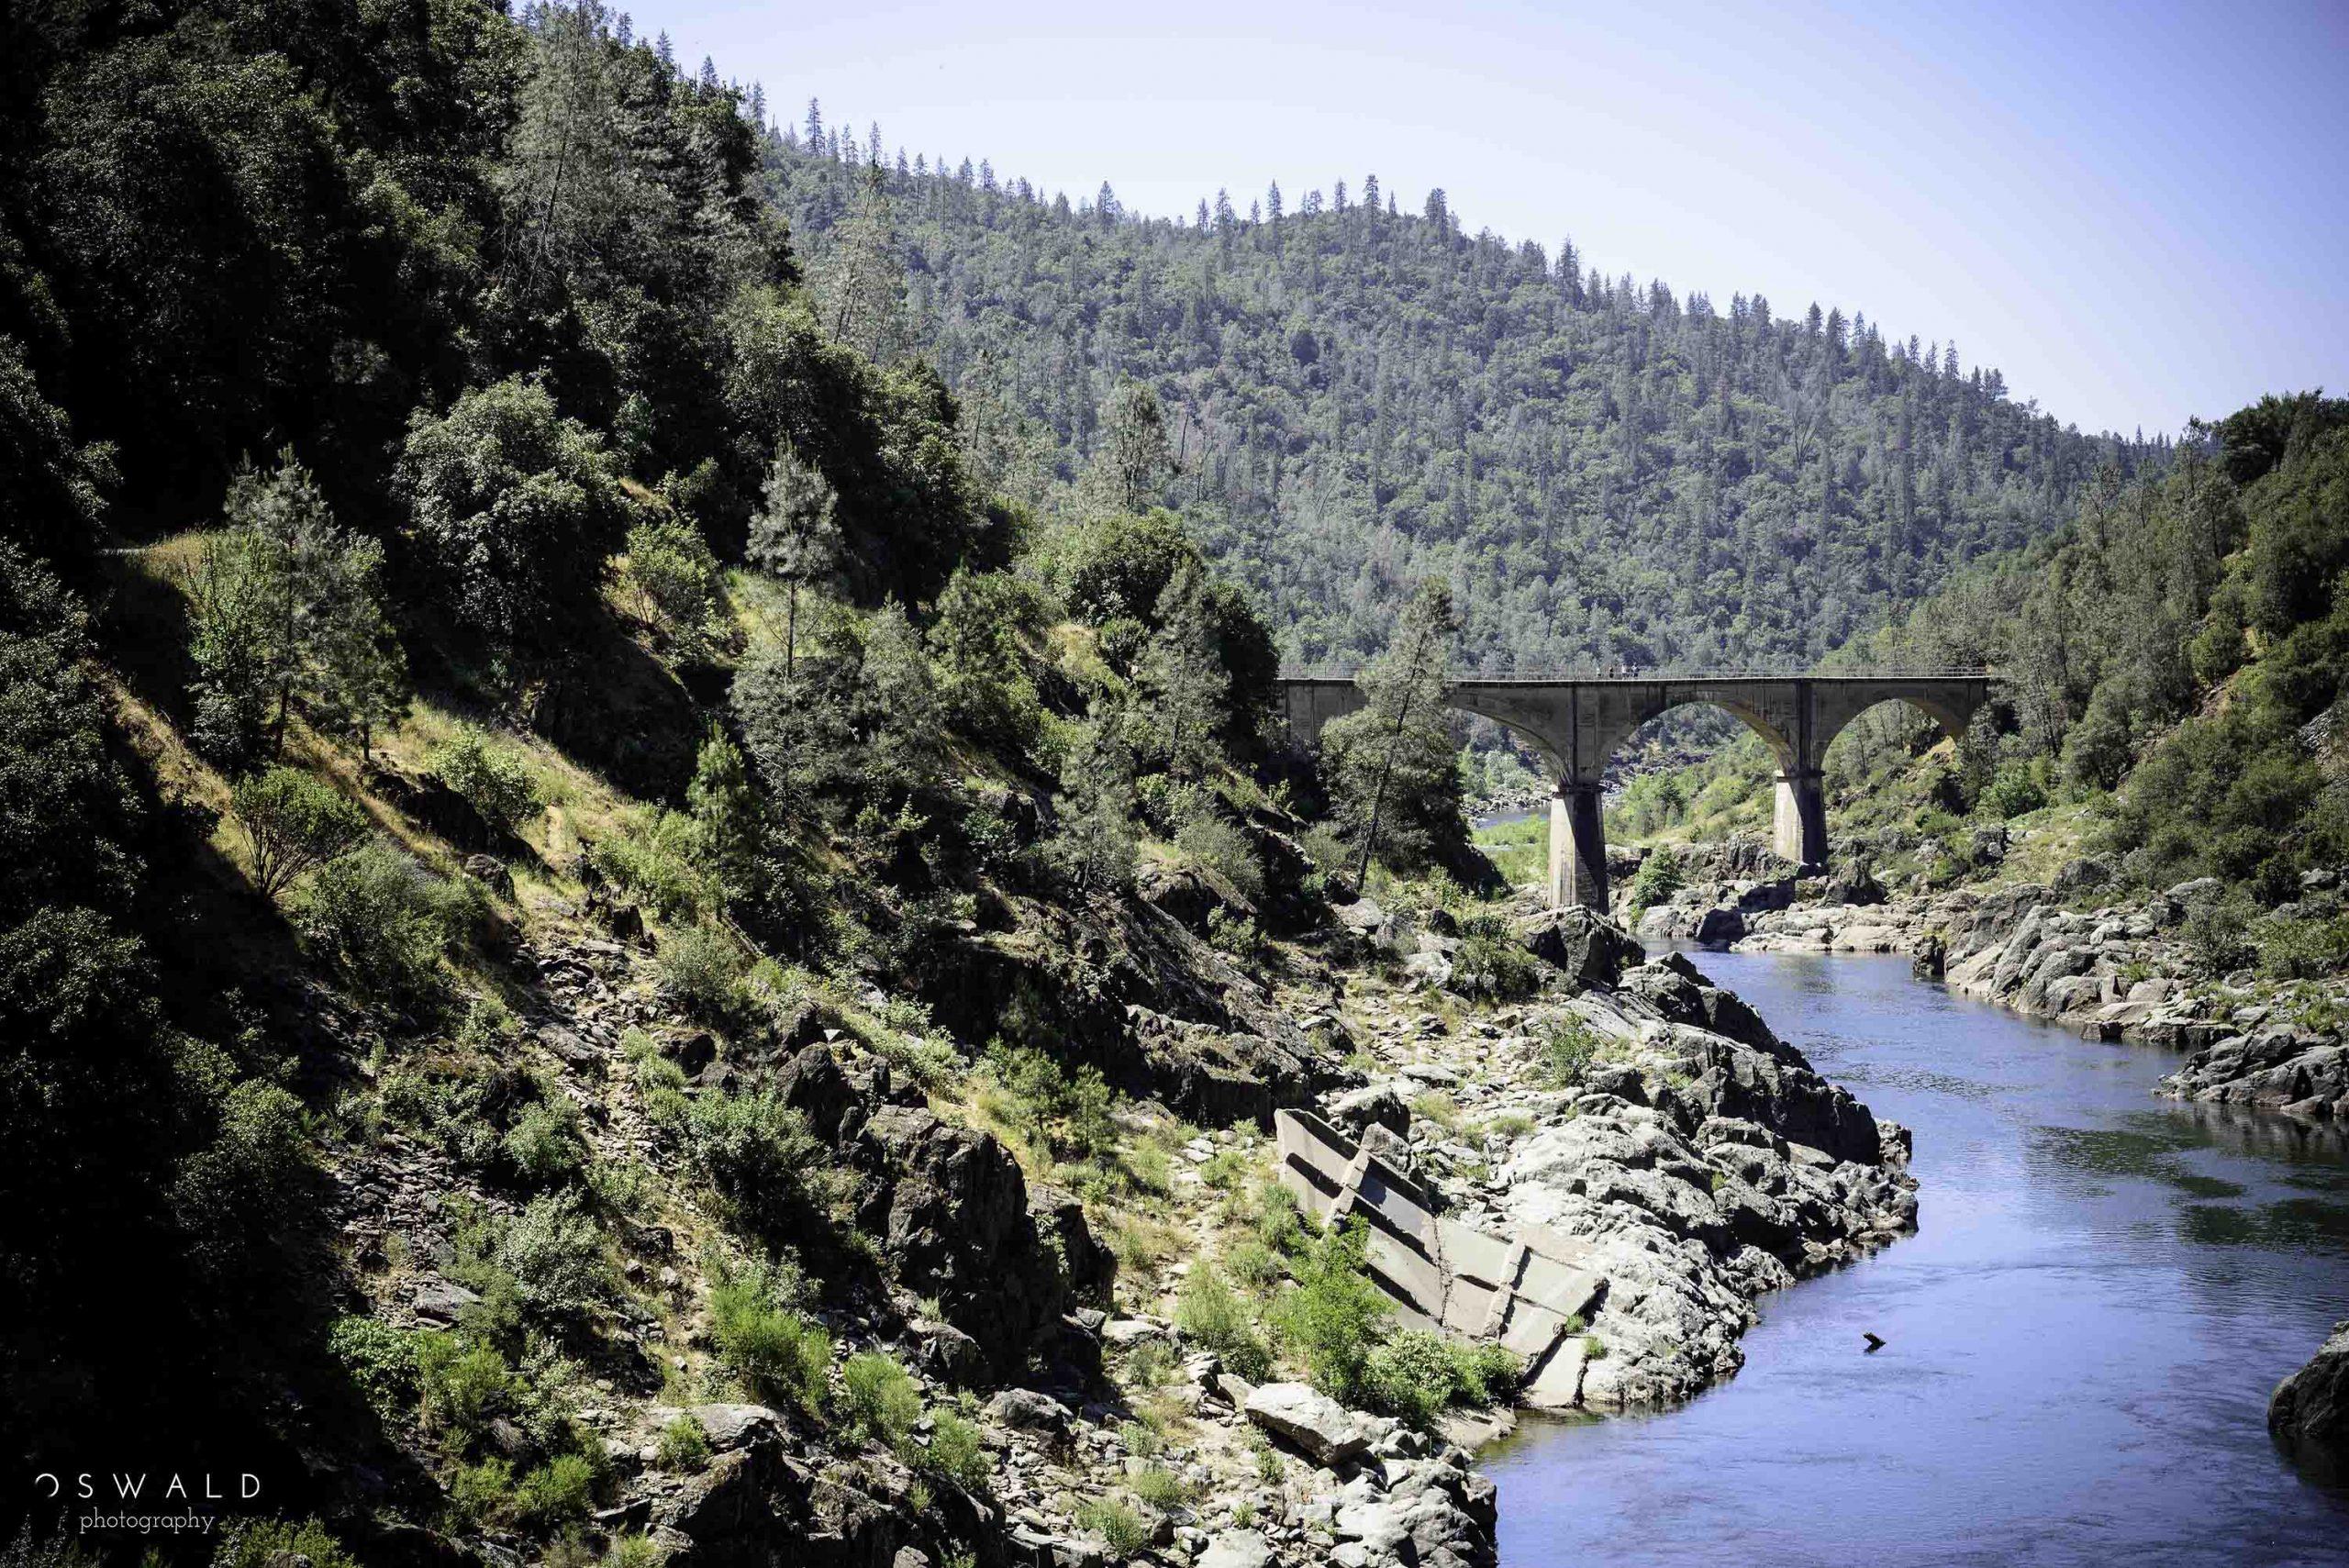 Landscape photograph of an old stone footbridge at the Auburn State Recreation Area near Auburn in Northern California.